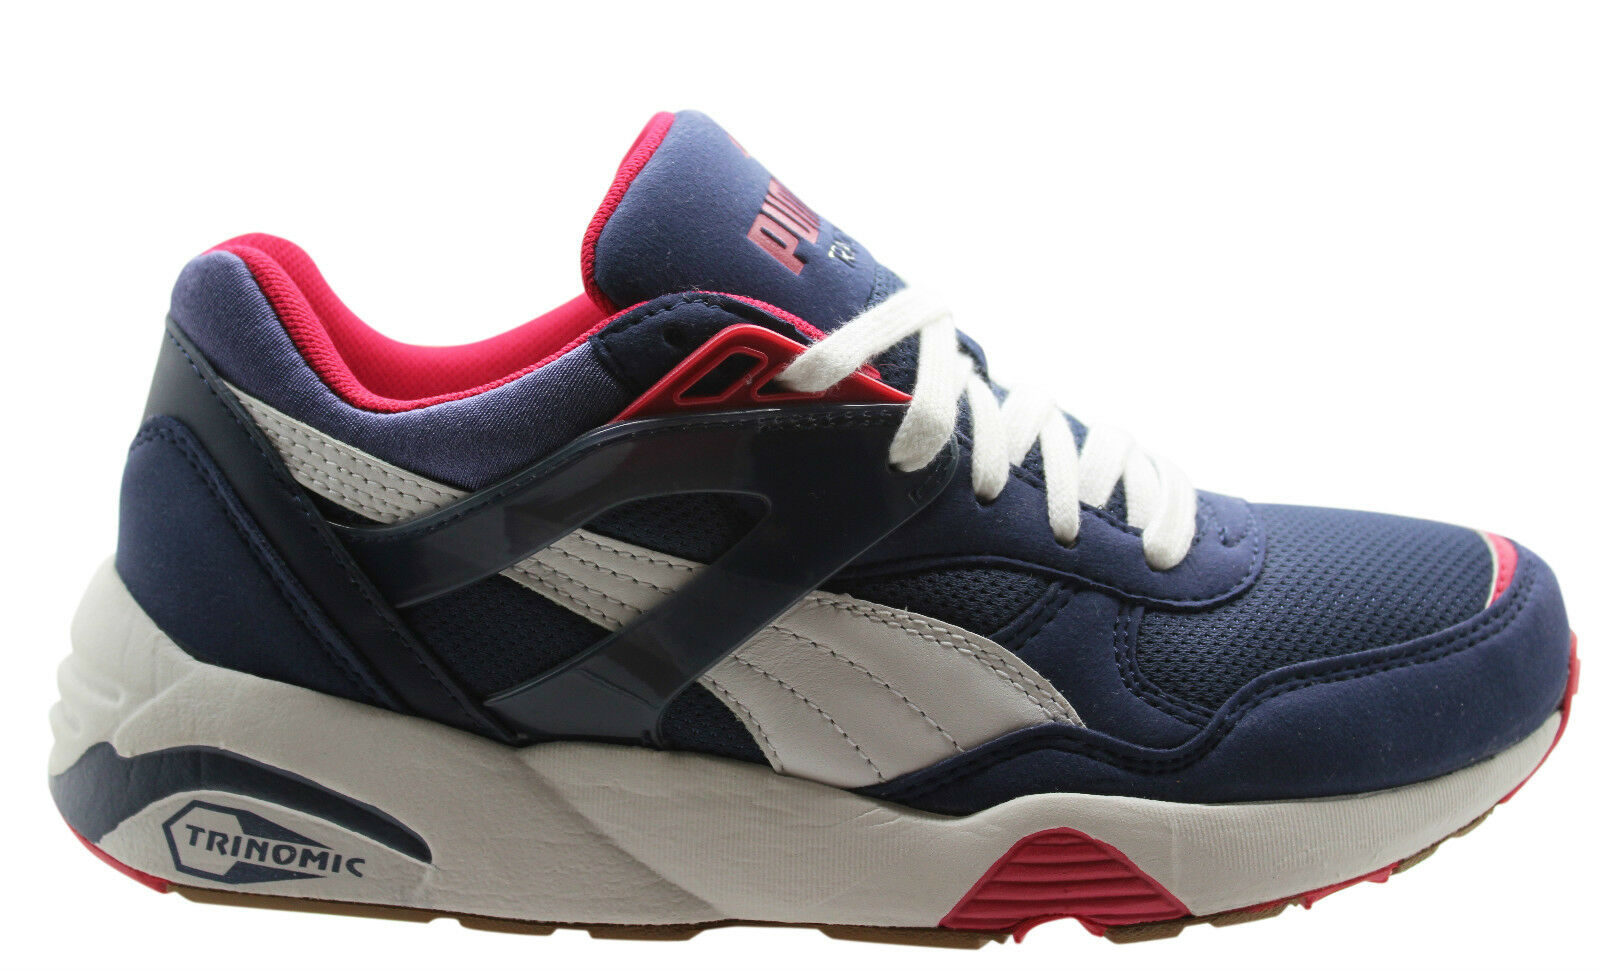 Puma r698 bianco sport femminili base pizzo formatori blu scuro, bianco r698 358068 02 d17 f1cf85